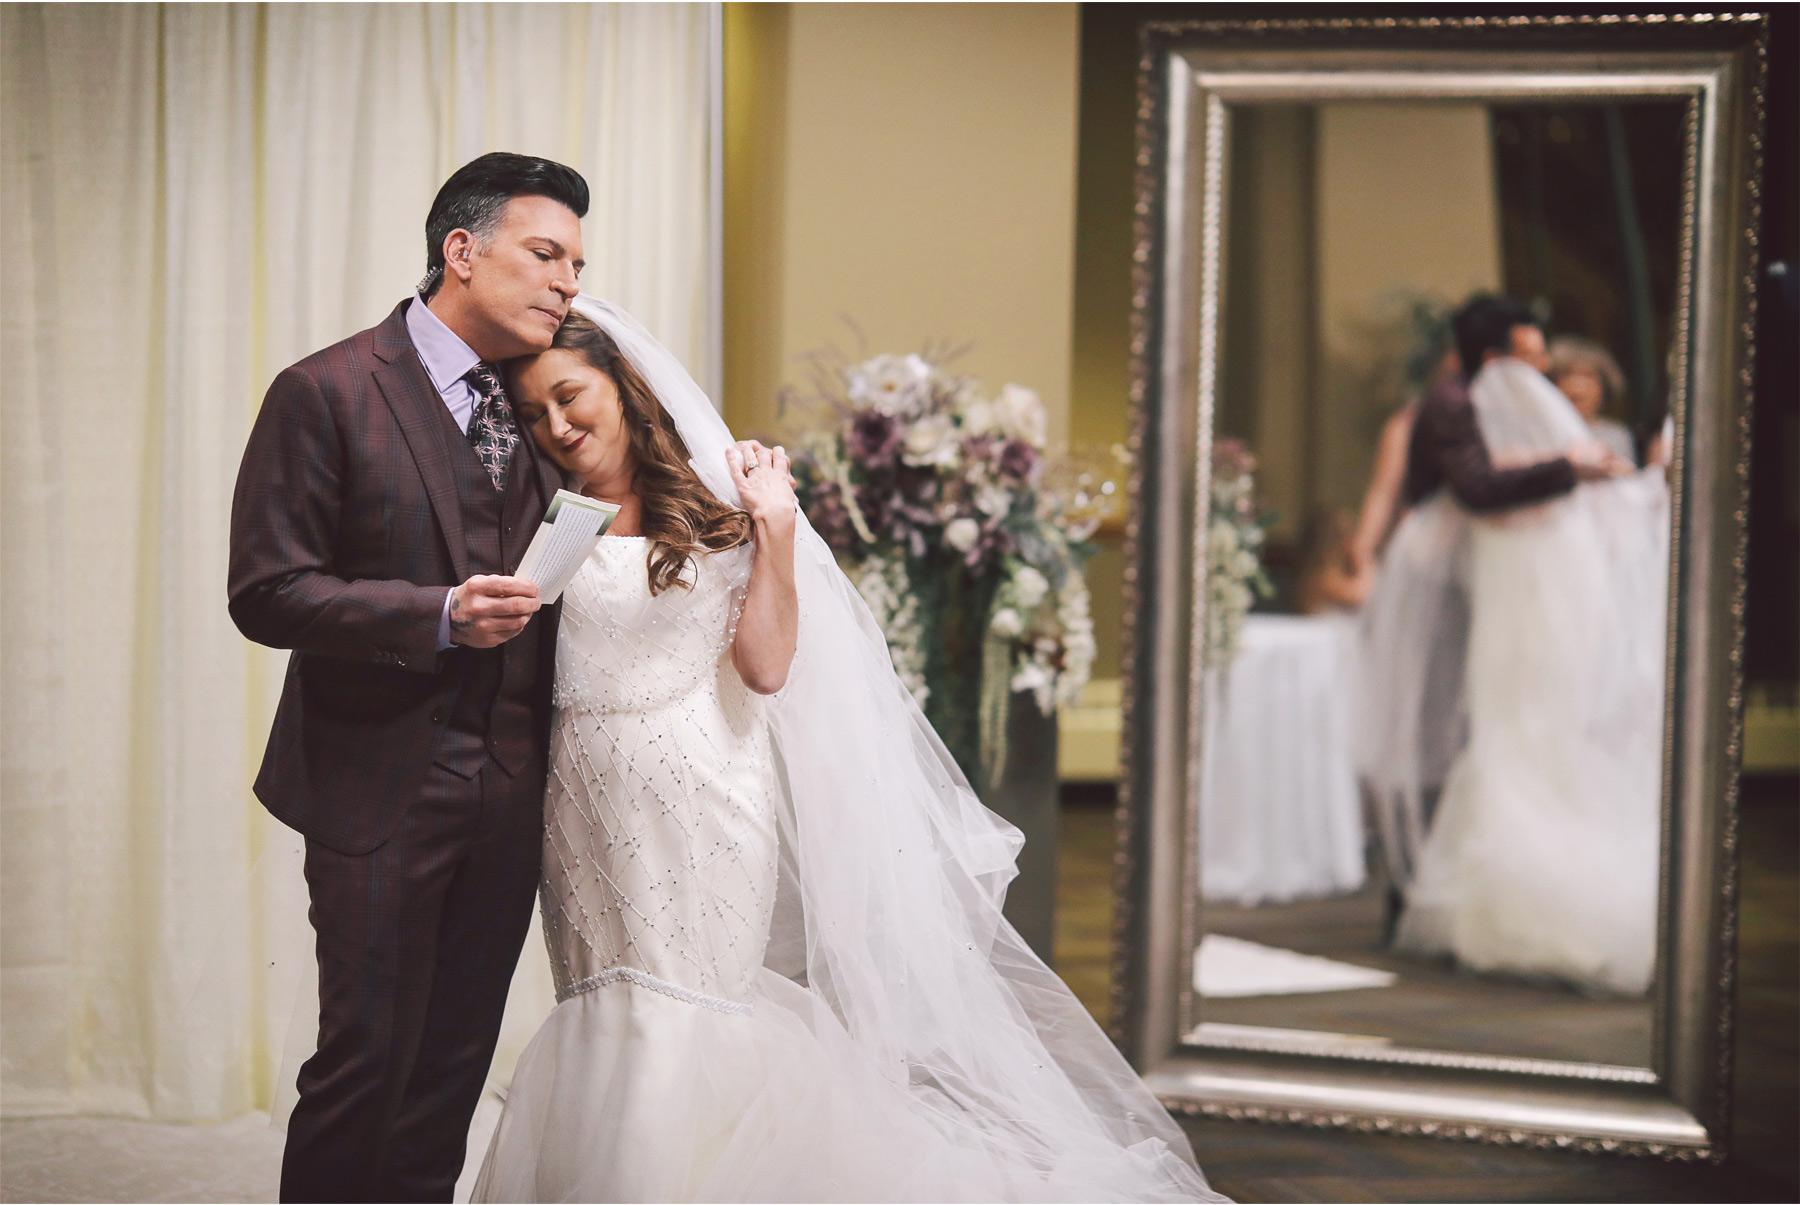 03-Saint-Paul-Minnesota-Wedding-by-Vick-Photography-Union-Depot-Lifetime-Network-David-Tutera-My-Great-Big-Live-Wedding-Dress-Bride-Jennifer-and-Rob.jpg